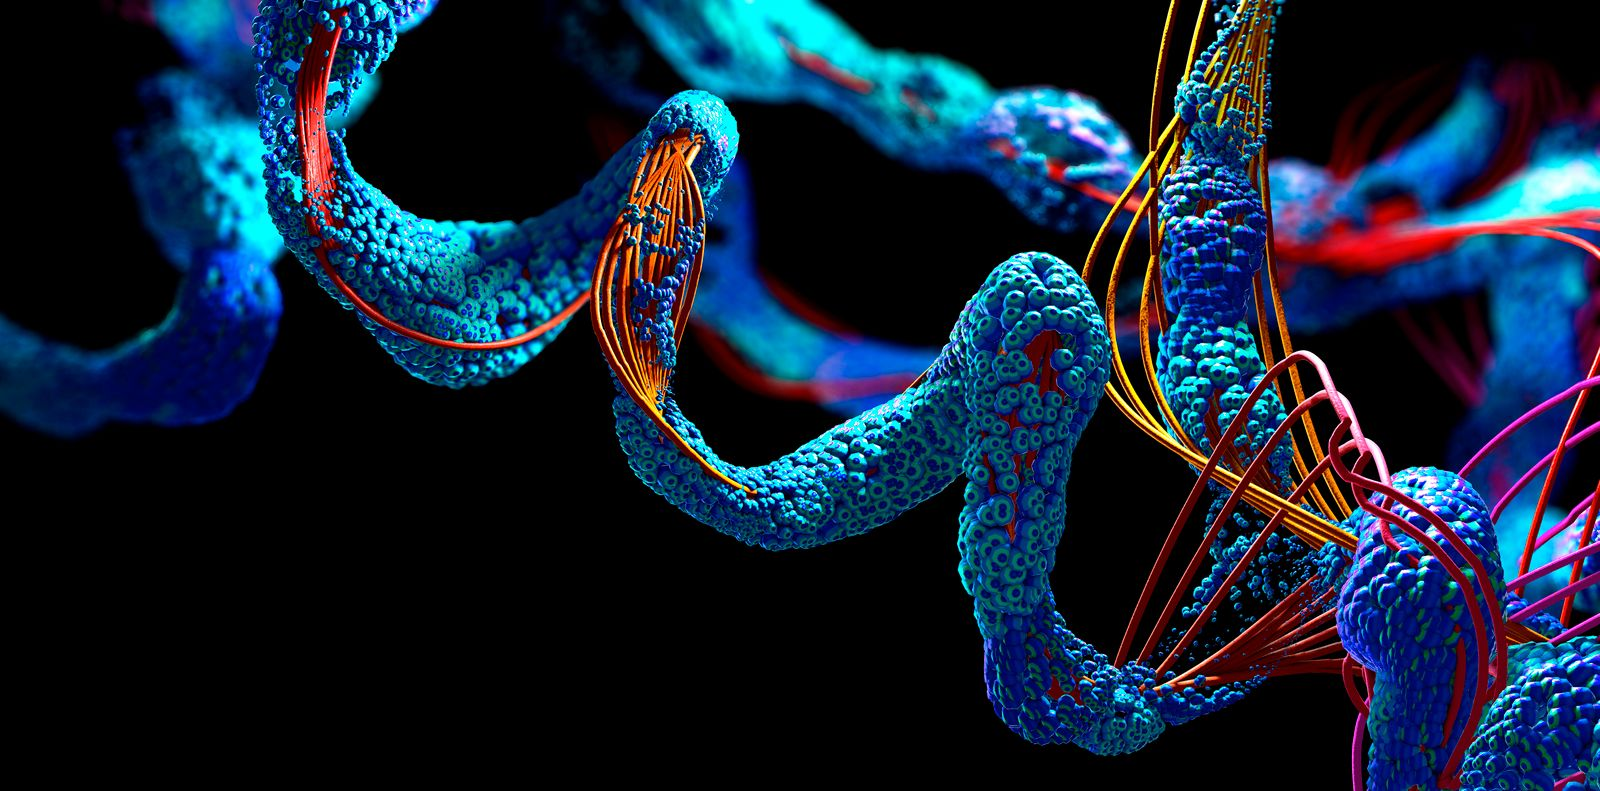 Protein, illustration Protein, 3d illustration. *** Protein, illustration Protein, 3d illustration PUBLICATIONxINxGERxSU